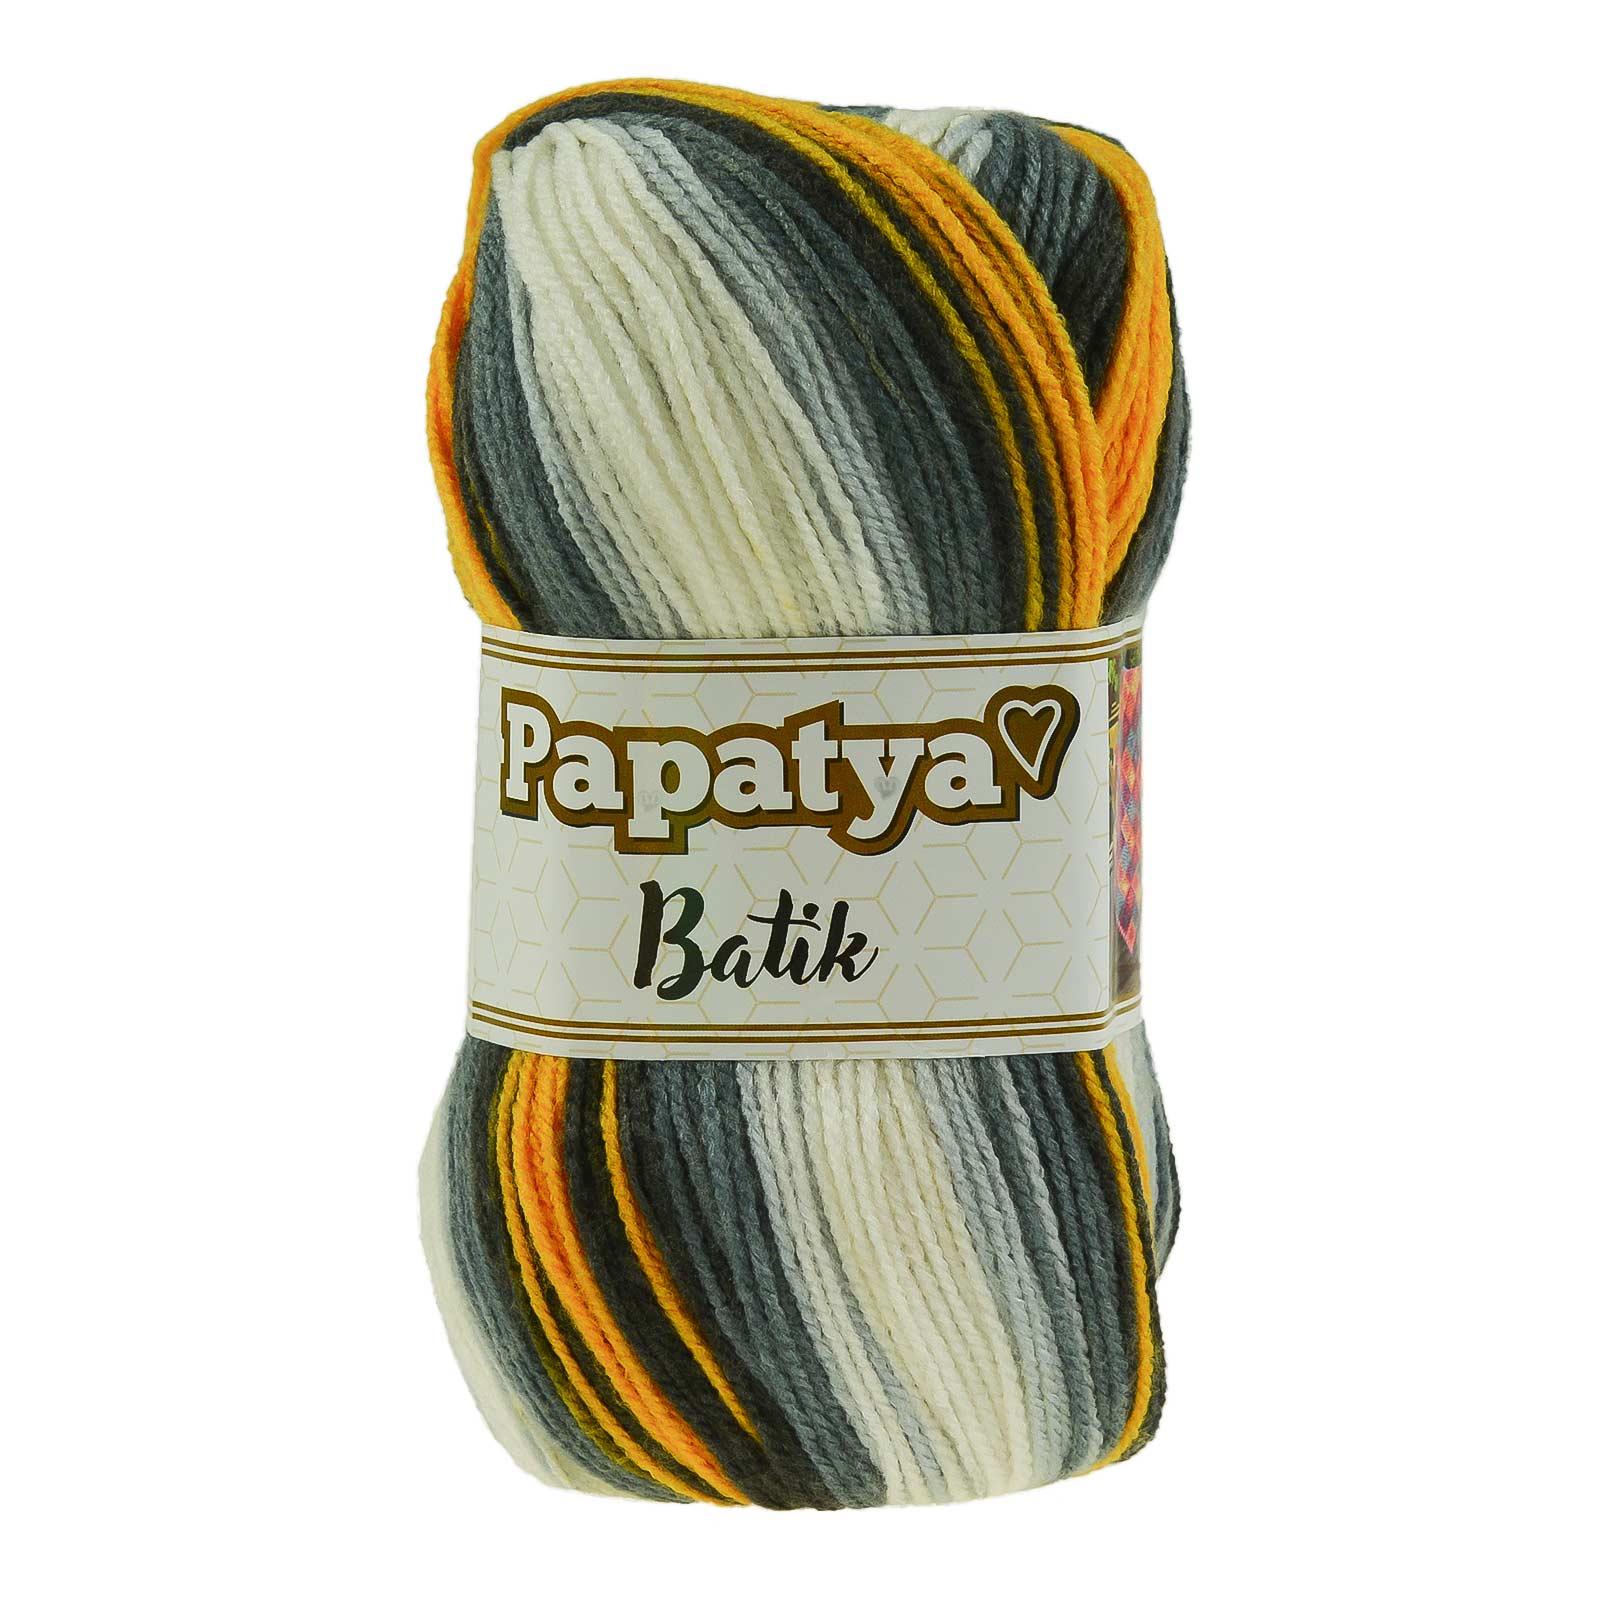 500g Farbverlaufsgarn Papatya Batik Strick-Wolle Strickgarn Häkelgarn Farbwahl – Bild 18